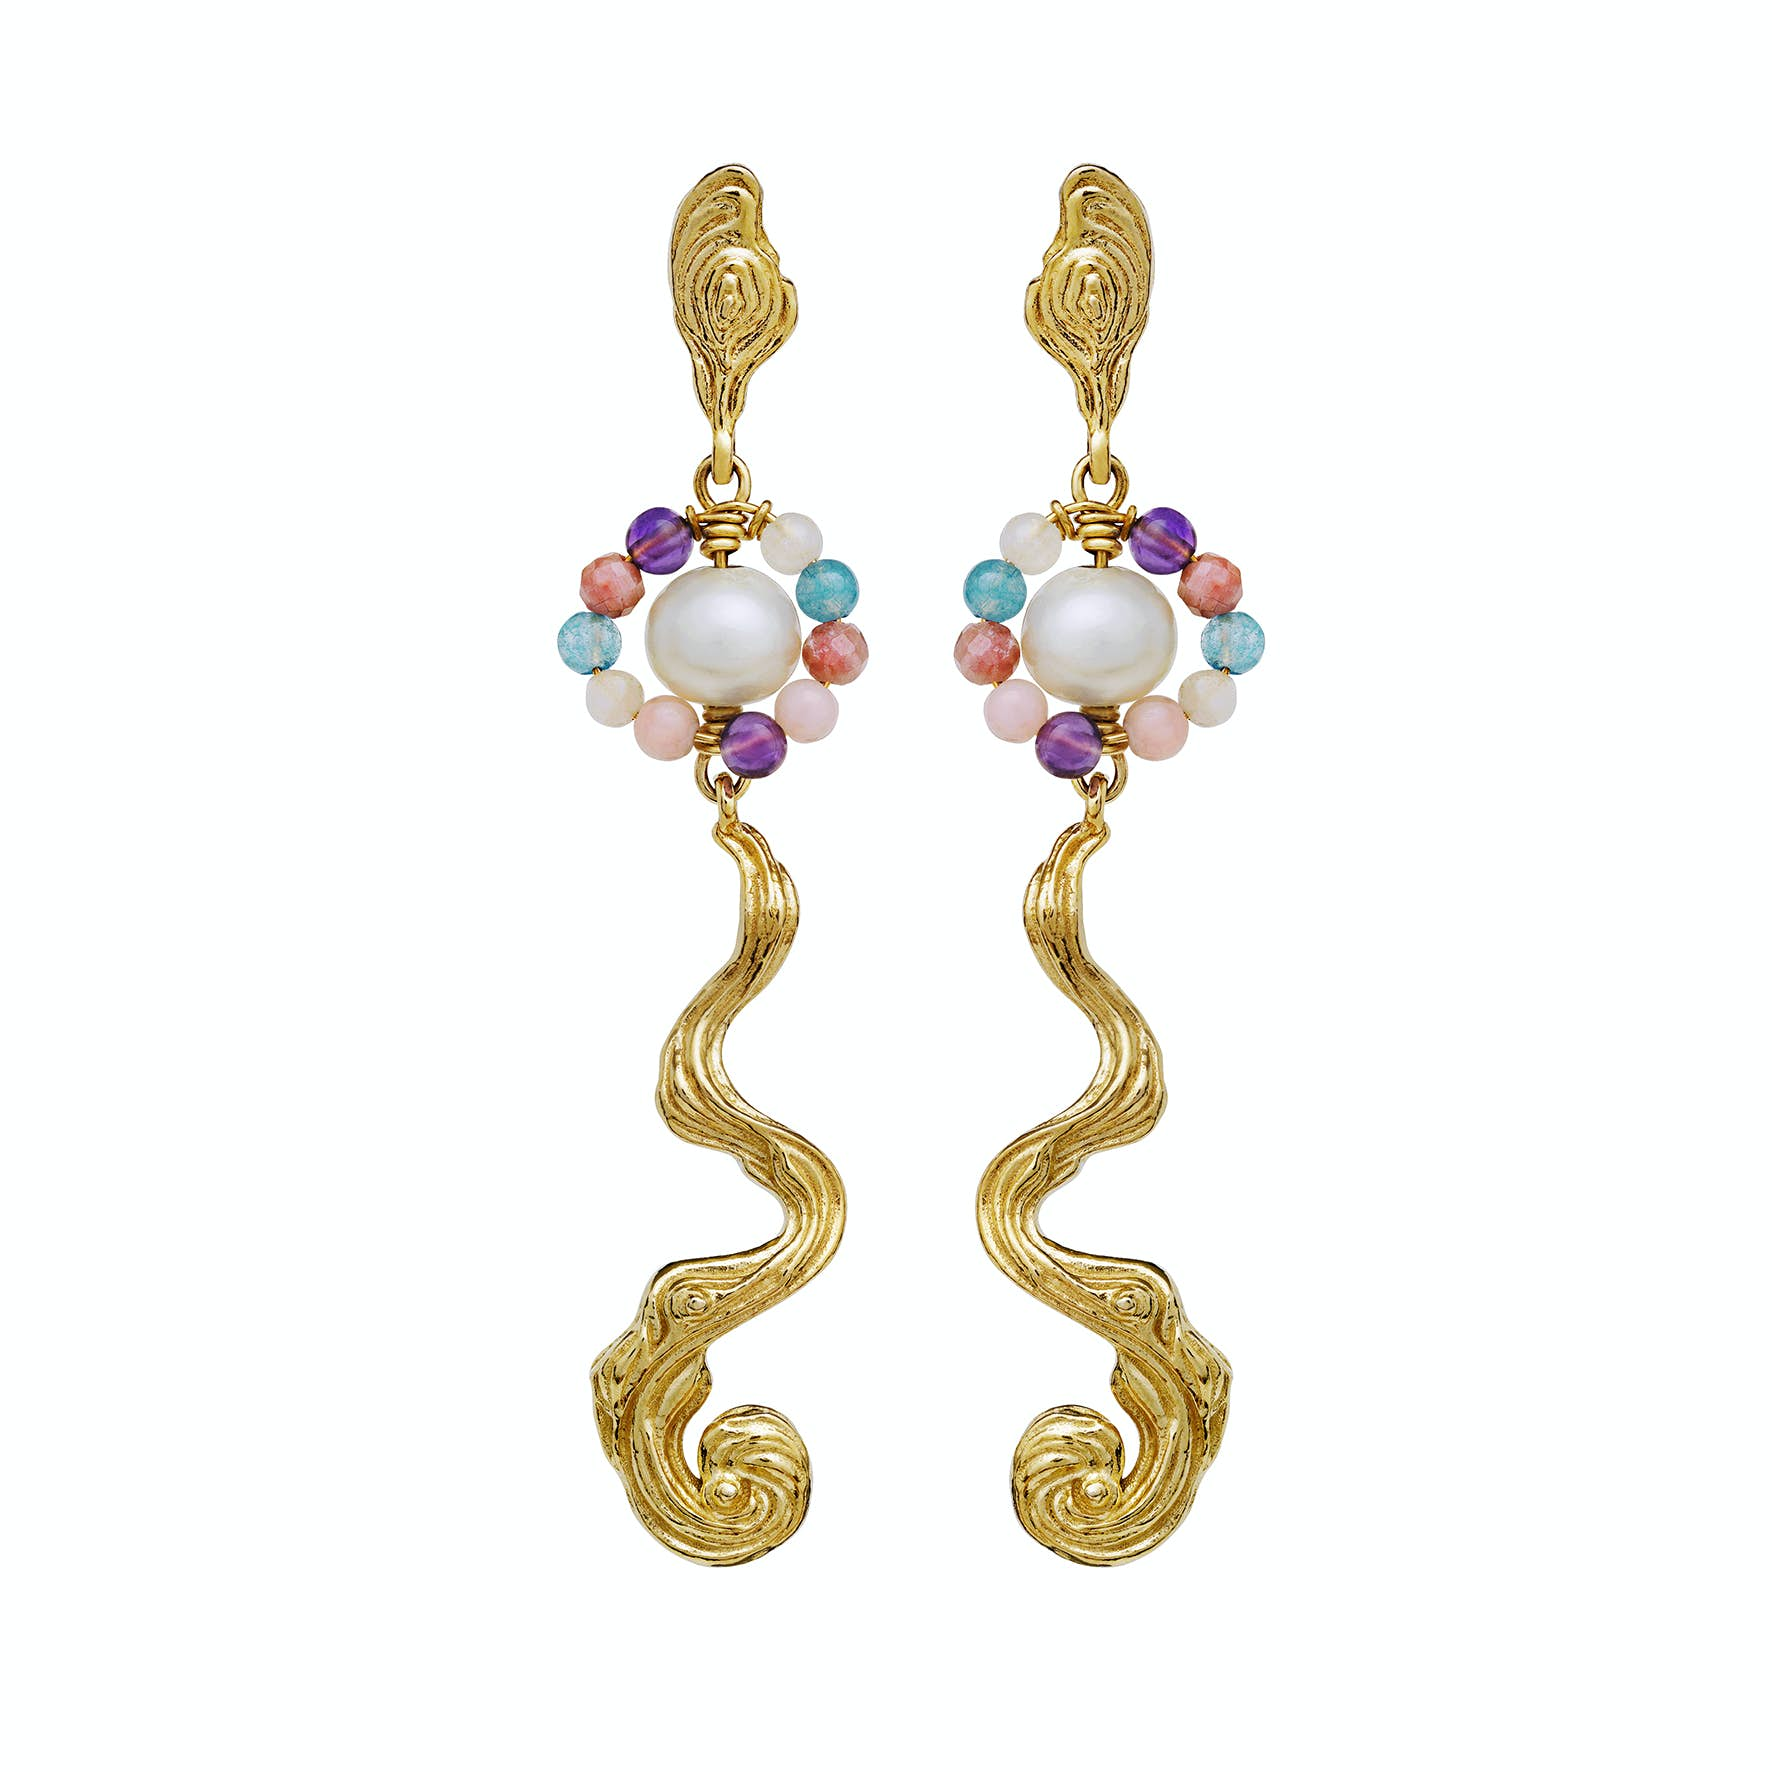 Parhelia Earrings von Maanesten in Vergoldet-Silber Sterling 925